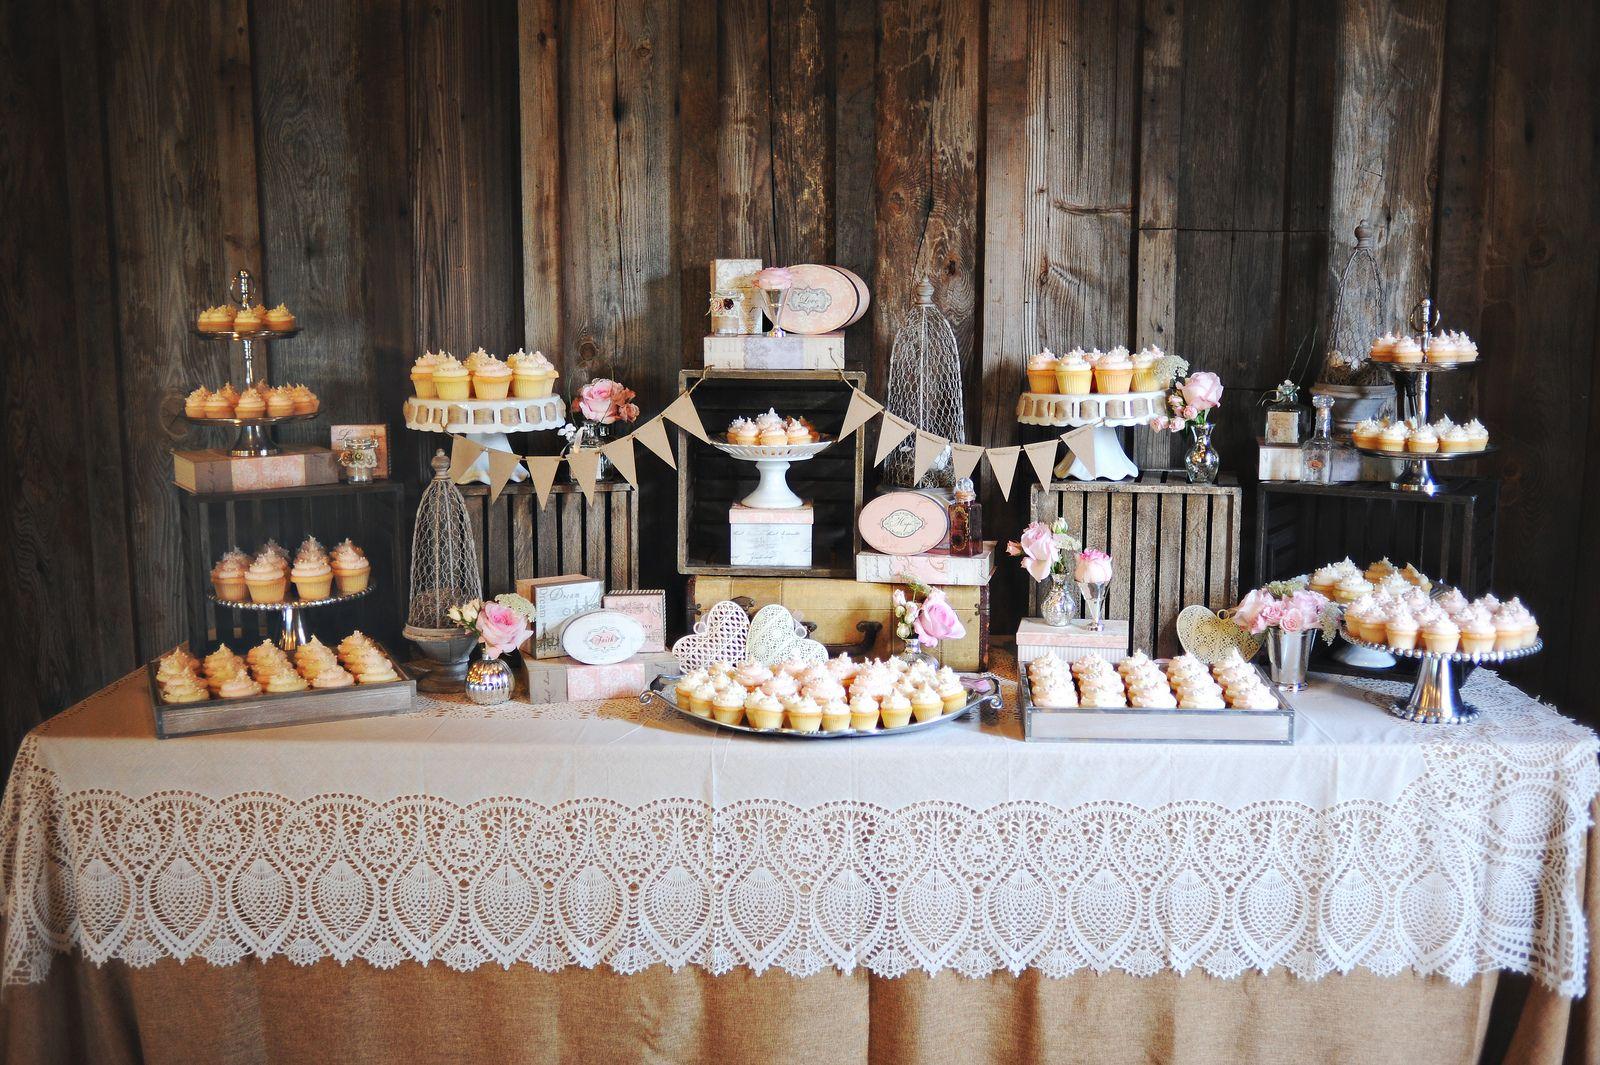 Www Melissashawphotography Com Flickr Photo Sharing Dessert Bar Wedding Wedding Dessert Table Wedding Desserts